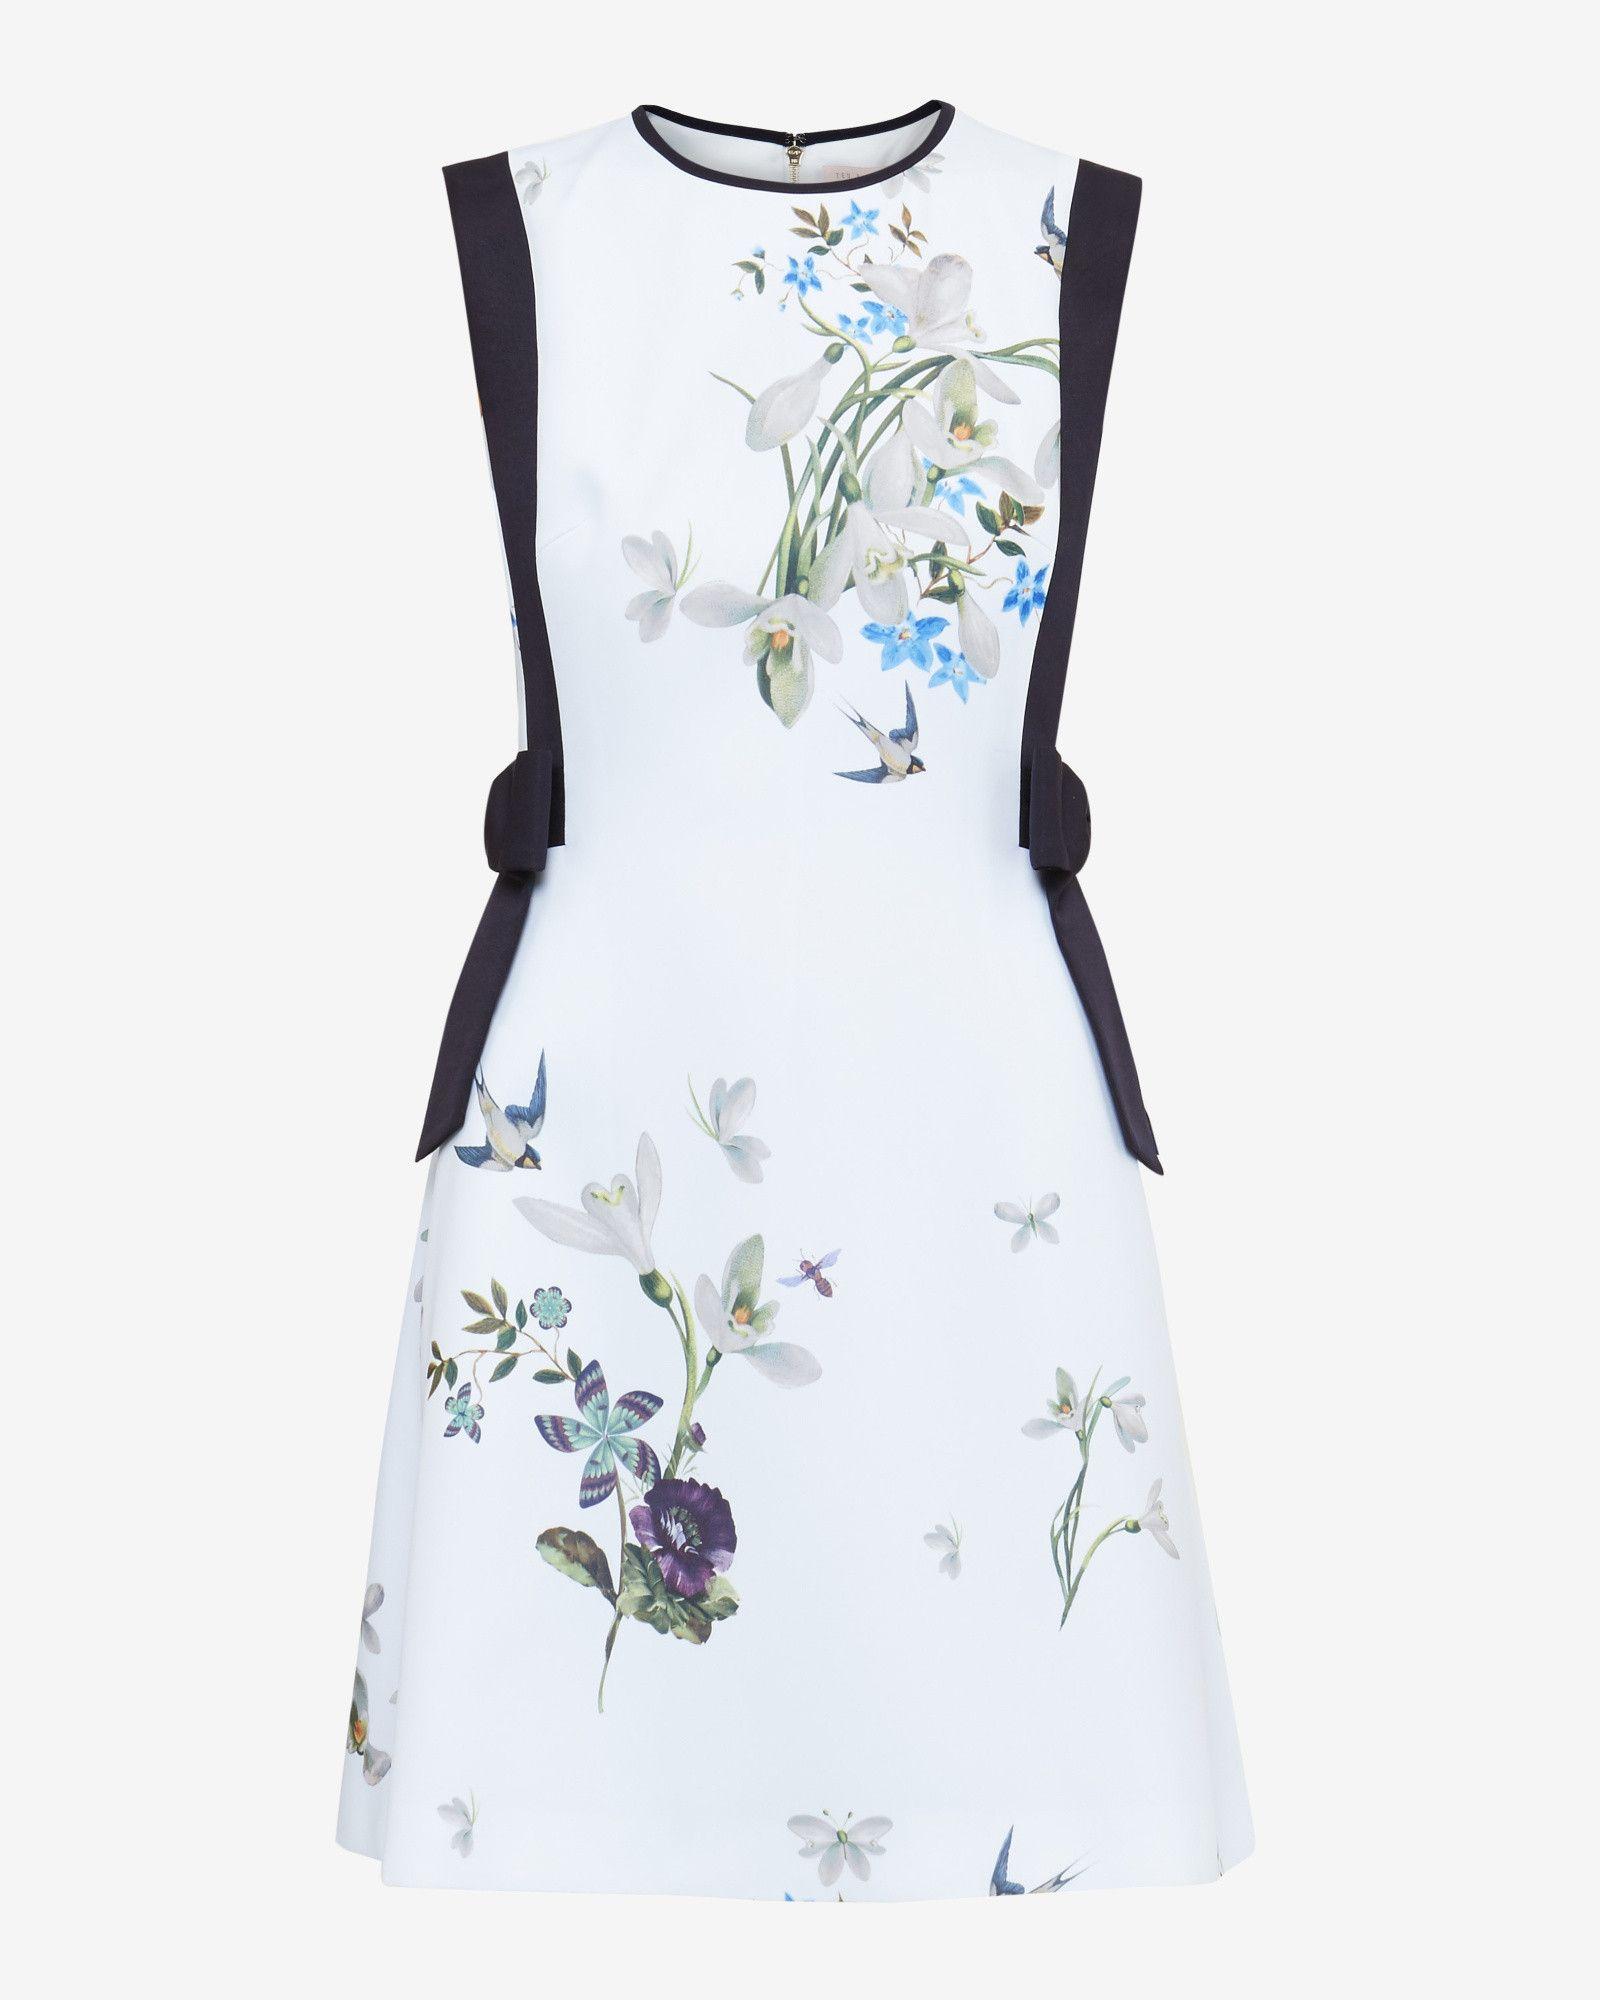 Spring Meadow Bow Detail Dress - Light Green